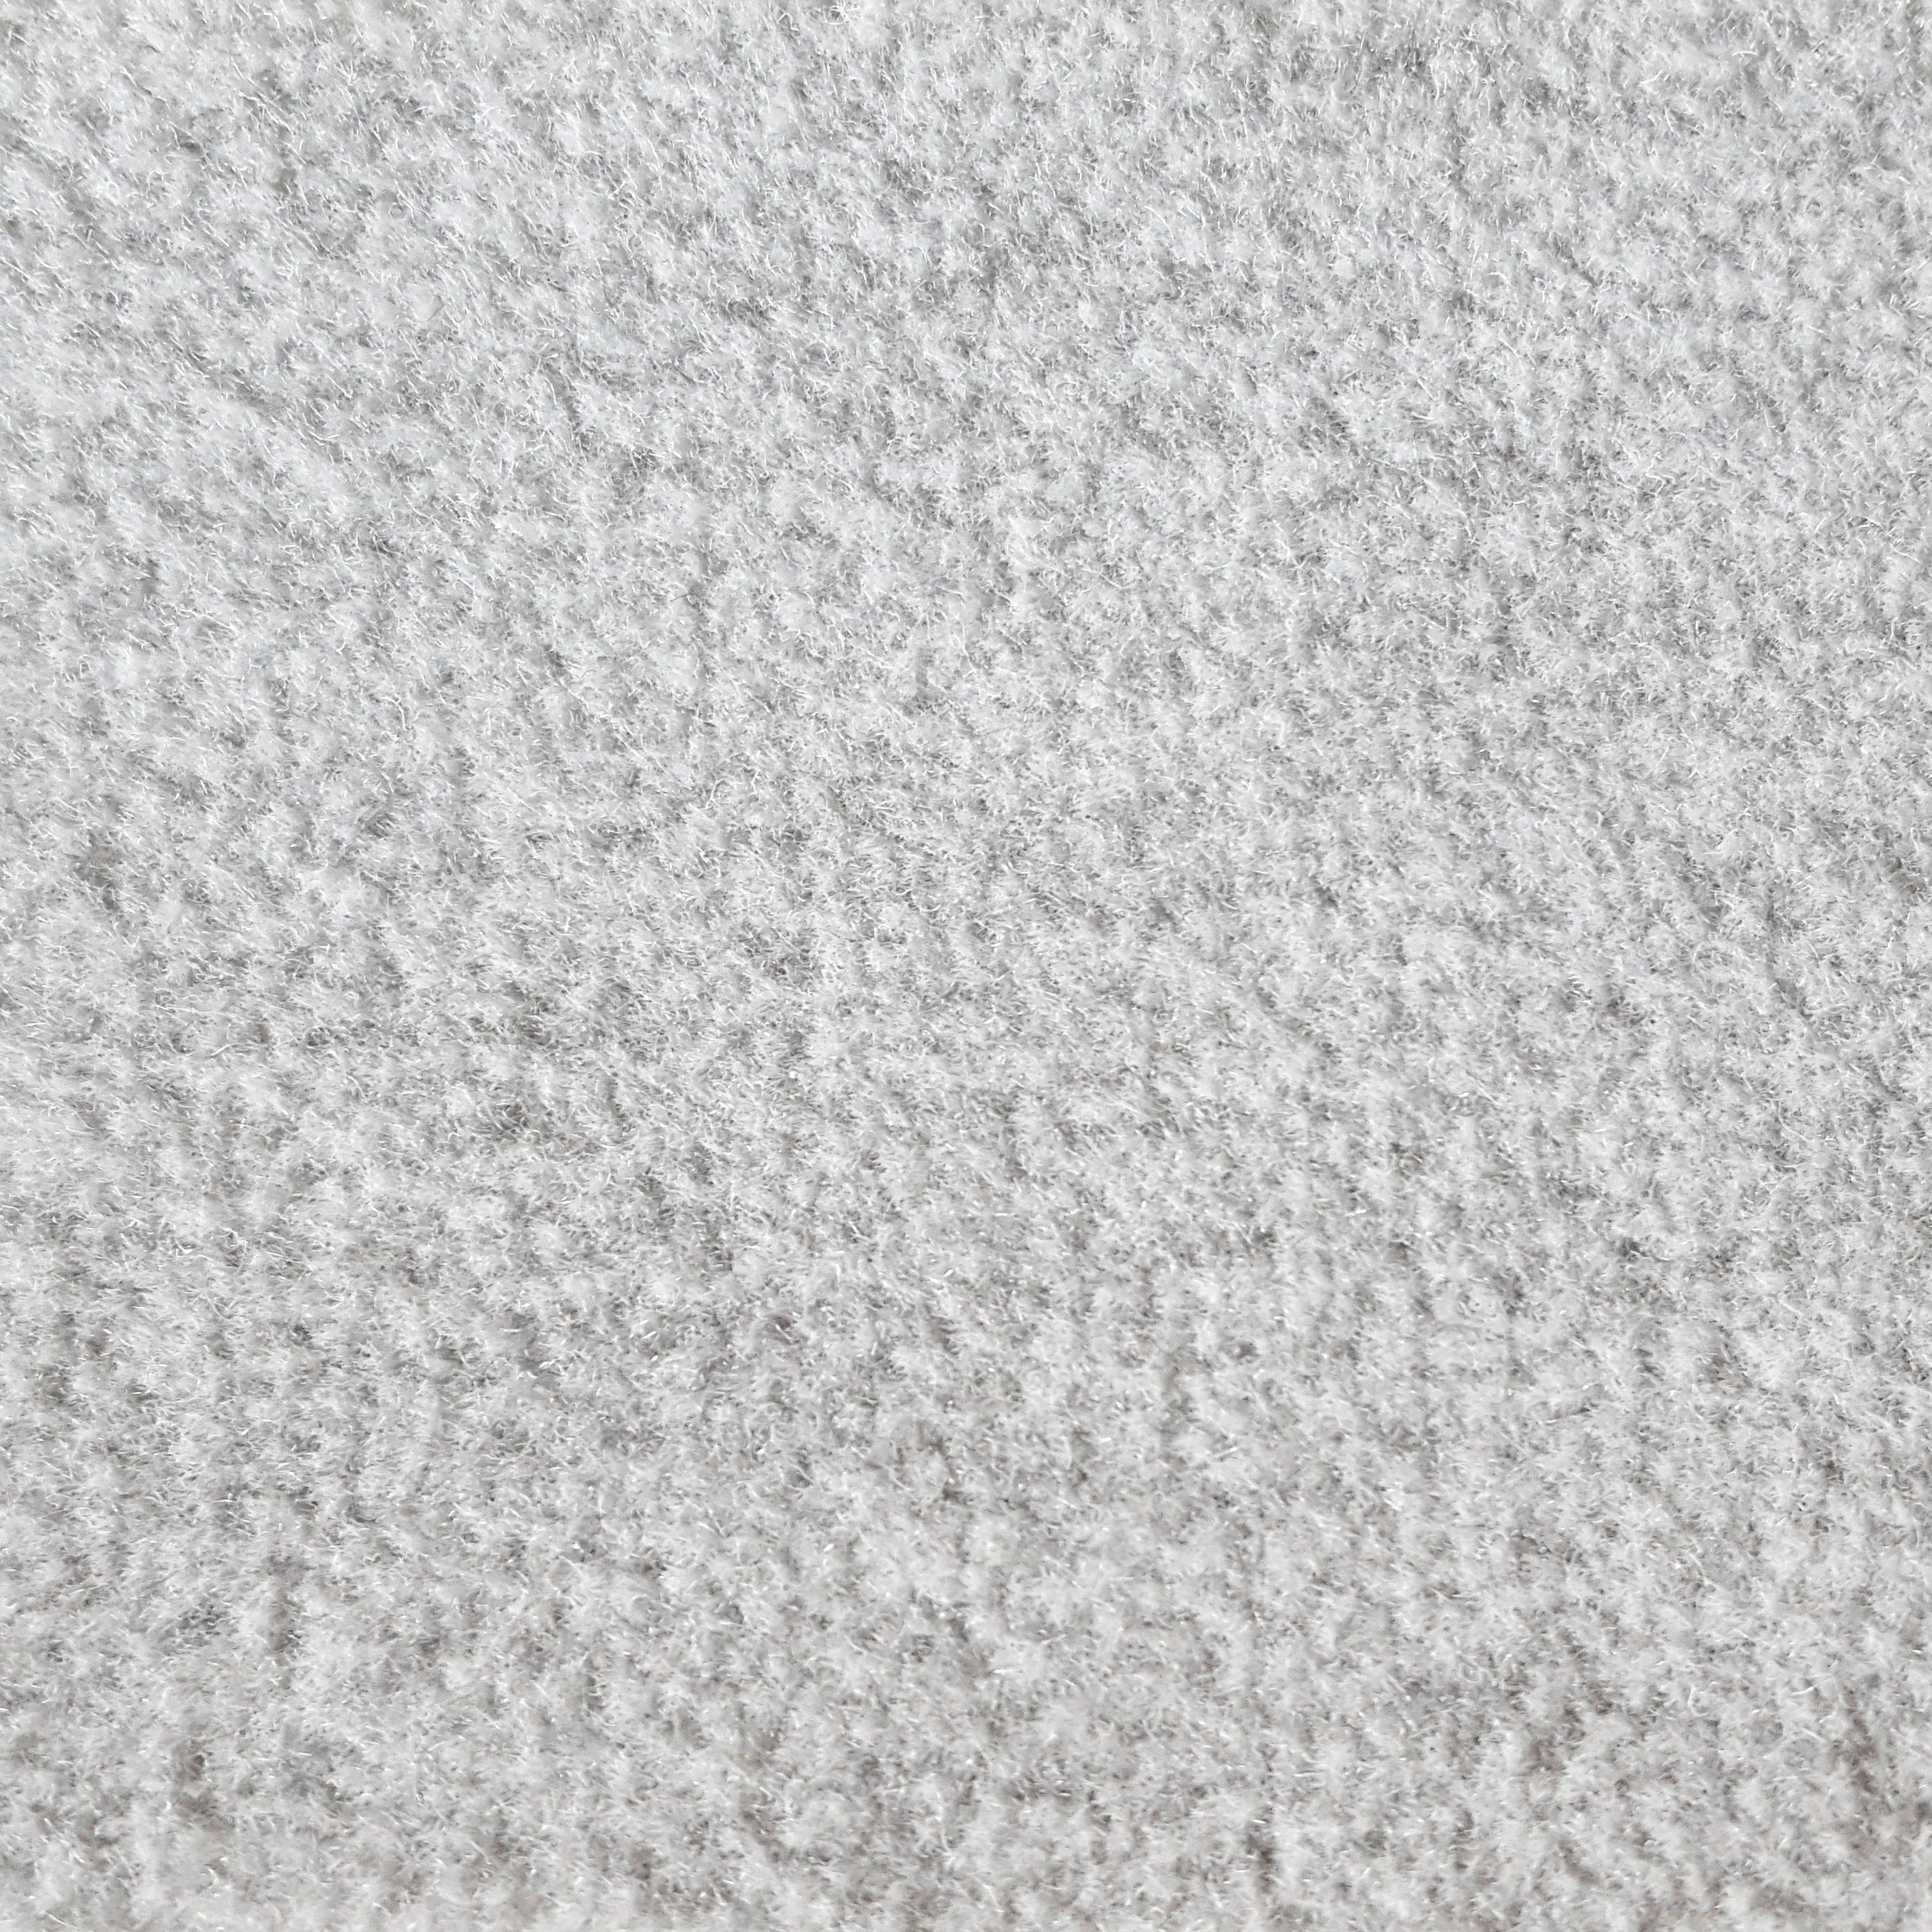 ANDIAMO Teppichboden »Steven hellgrau«, Breite 500 cm